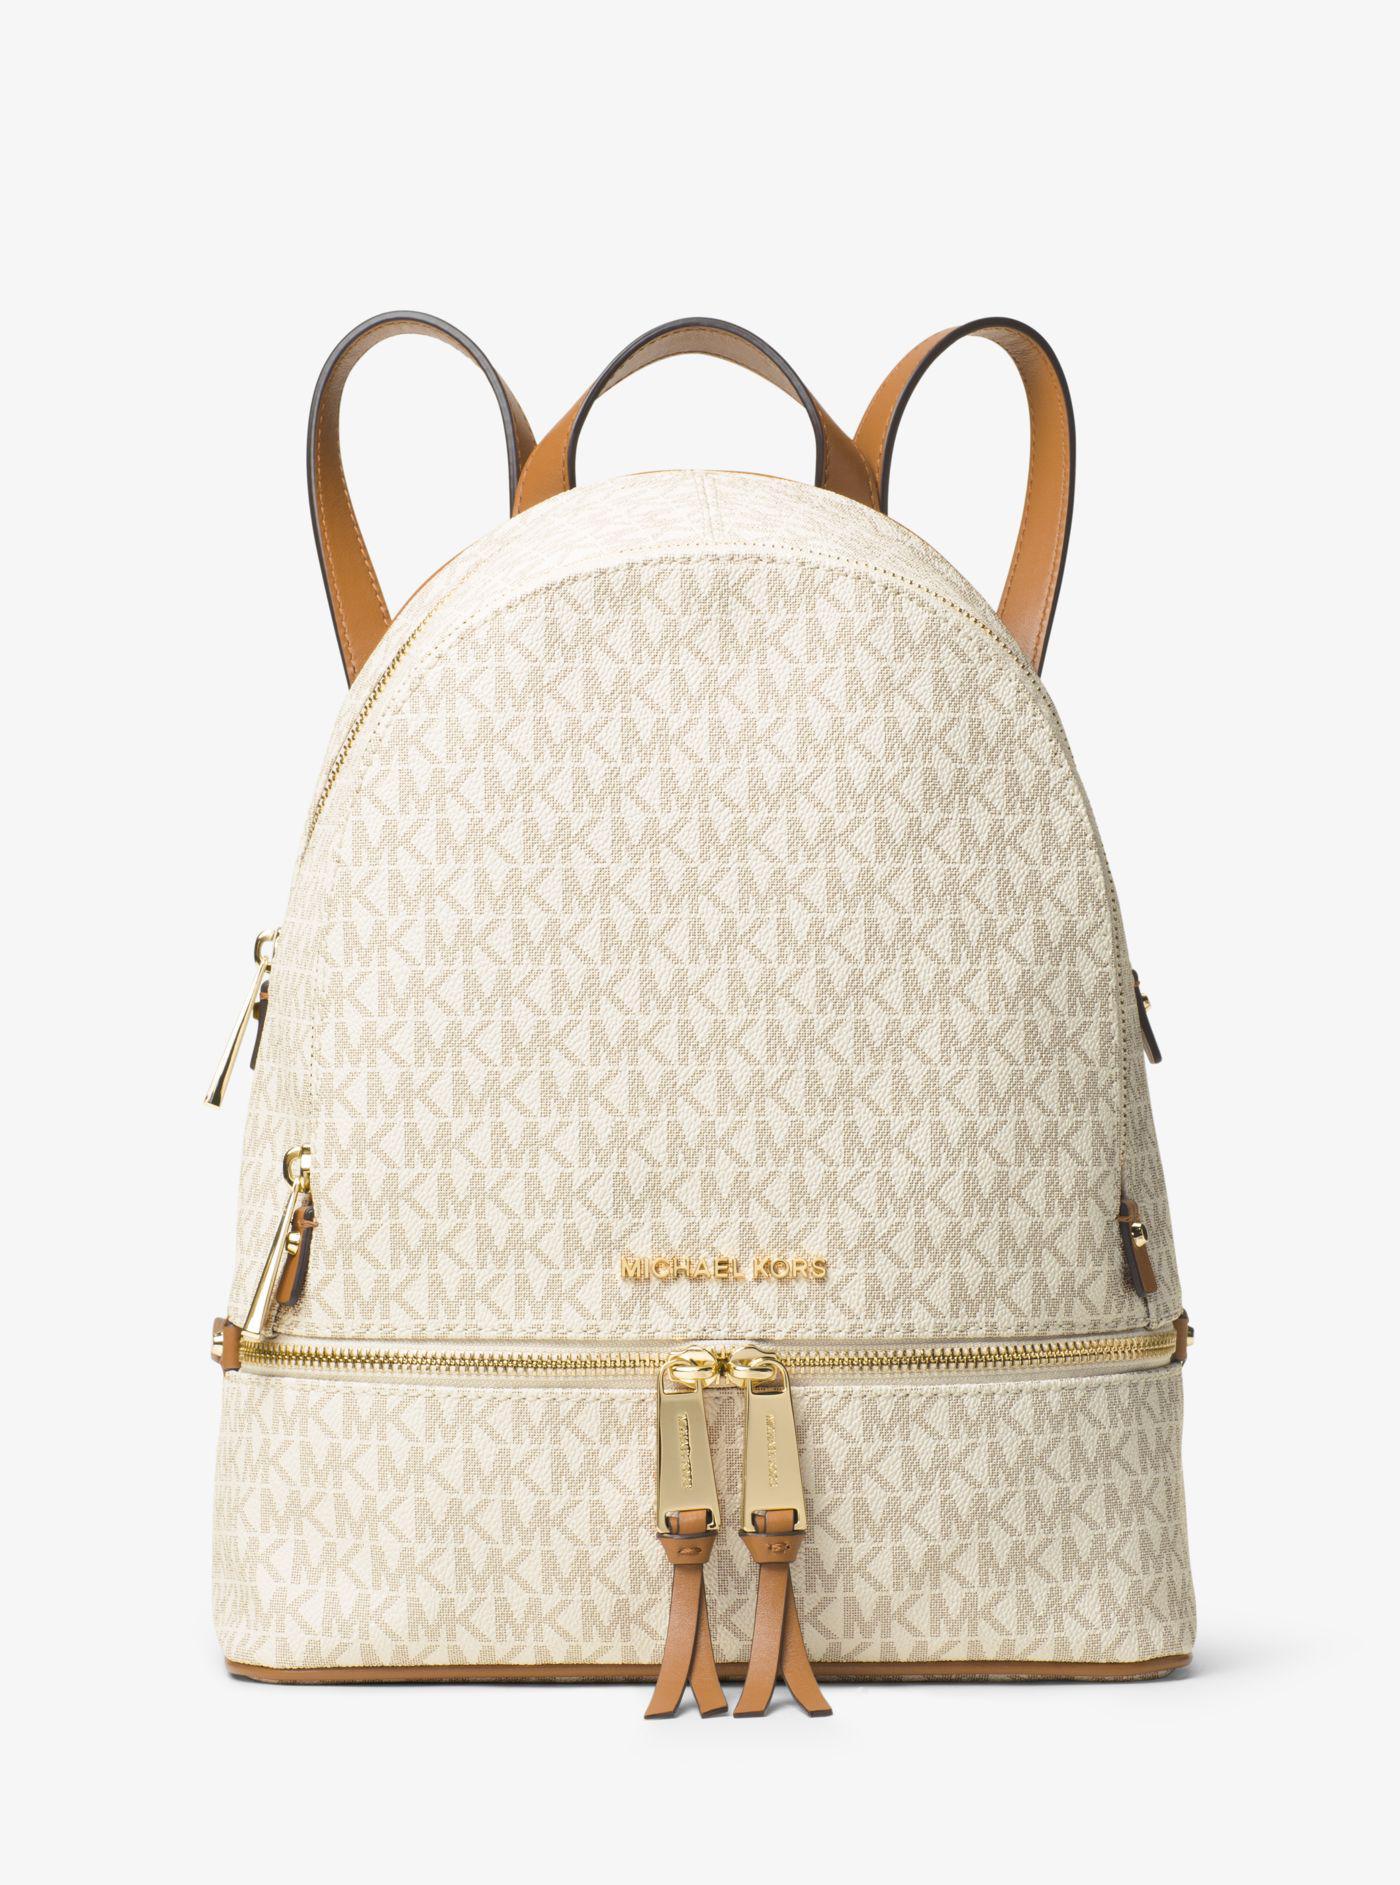 bdfddb353907 Lyst - Michael Kors Rhea Medium Backpack in Natural - Save 27%